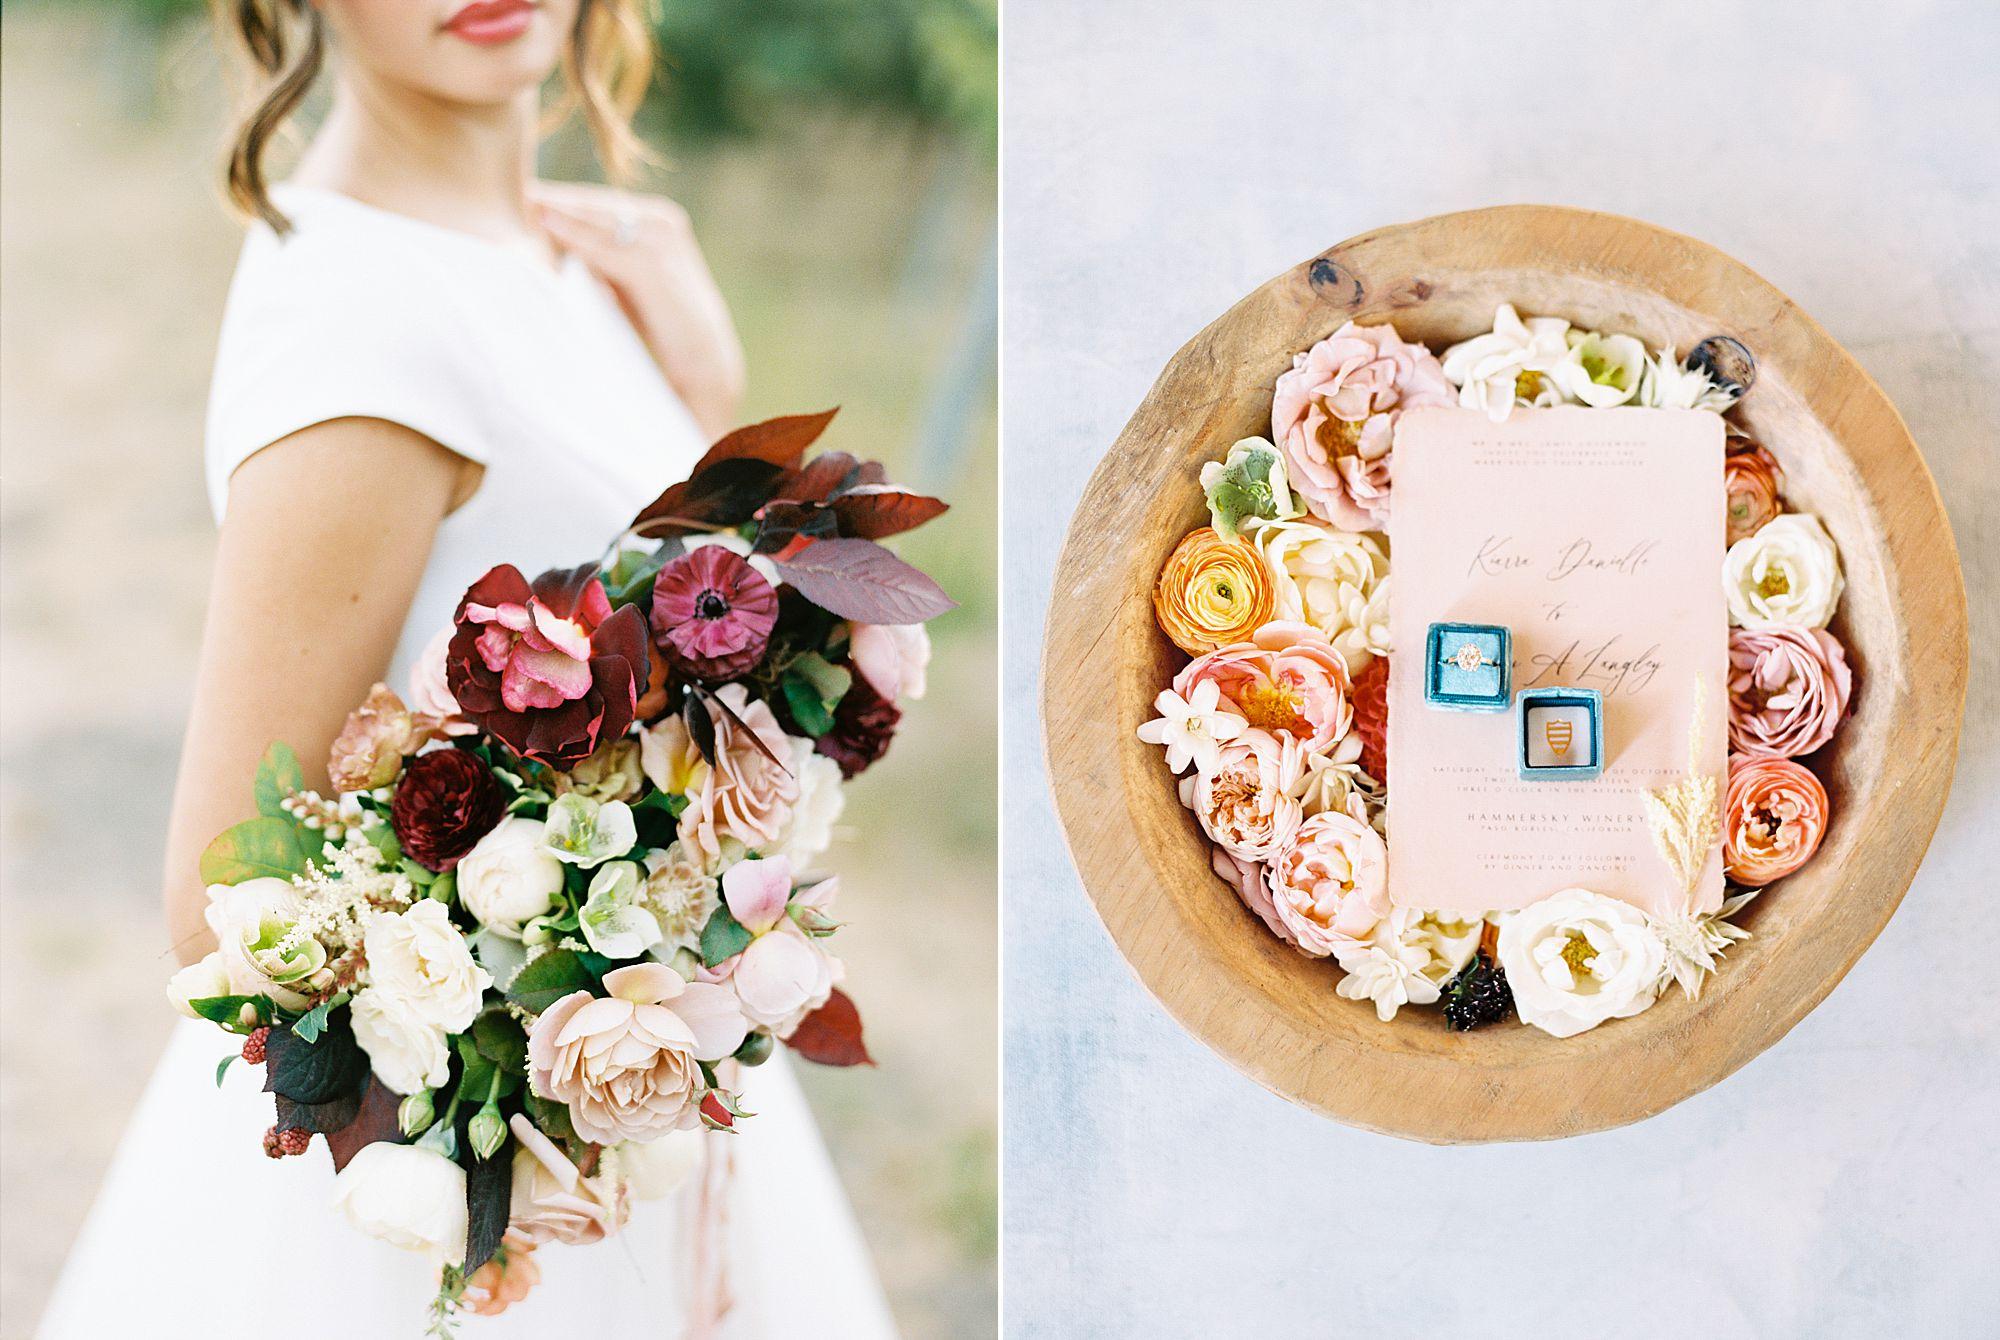 HammerSky Wedding Inspiration Featured on Hey Wedding Lady with Vanessa Noel Events - Ashley Baumgartner - SLO Wedding Photographer_0015.jpg